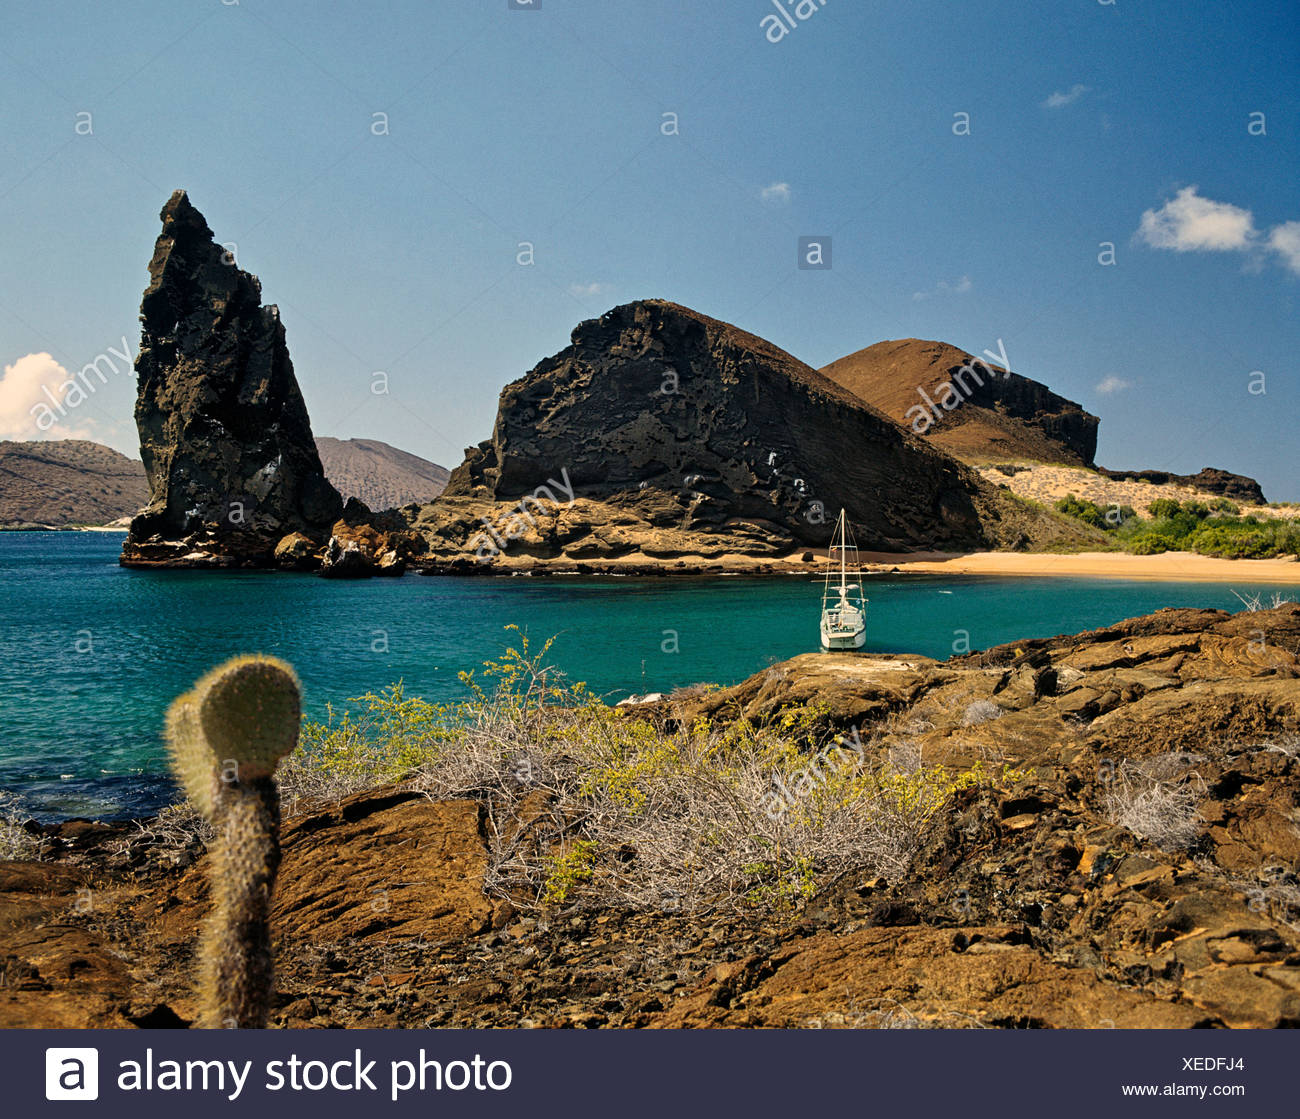 Pinnacle Rock, Pináculo, Bartolome Island, Galapagos Islands, Ecuador - Stock Image